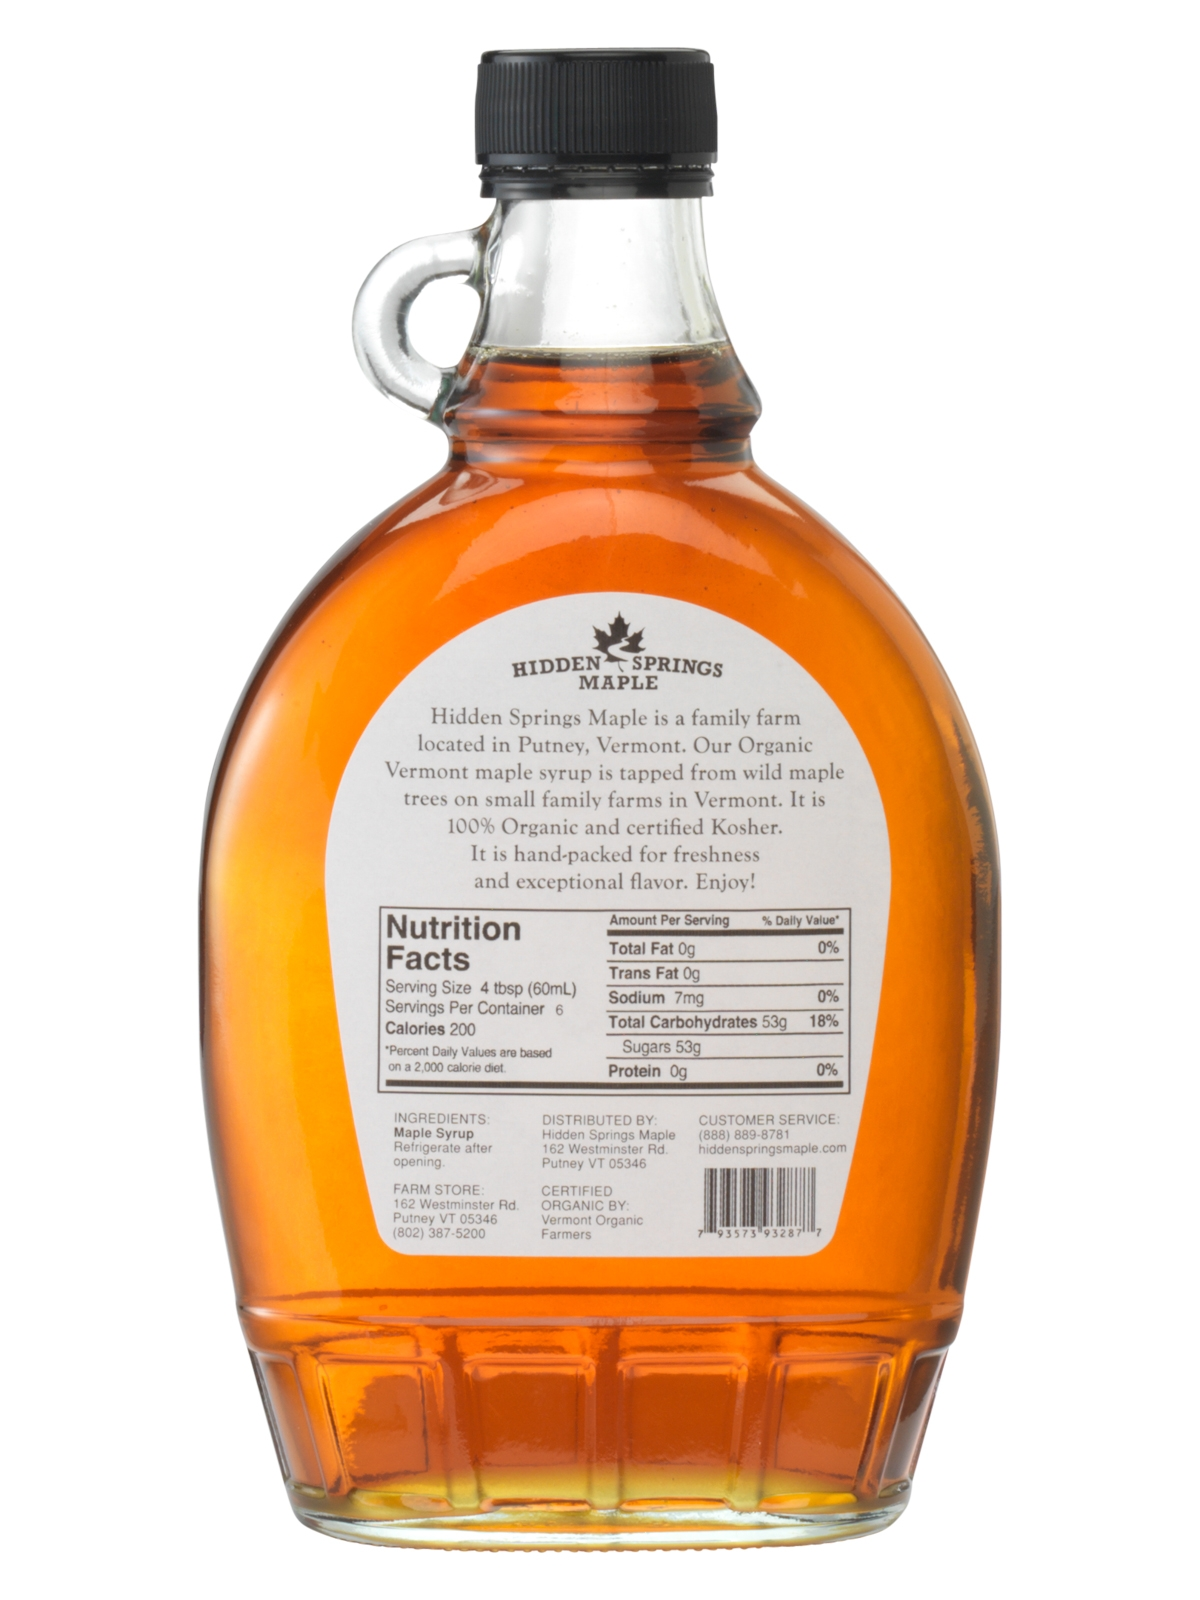 Glass Bottle Organic Maple Syrup Hidden Springs Maple